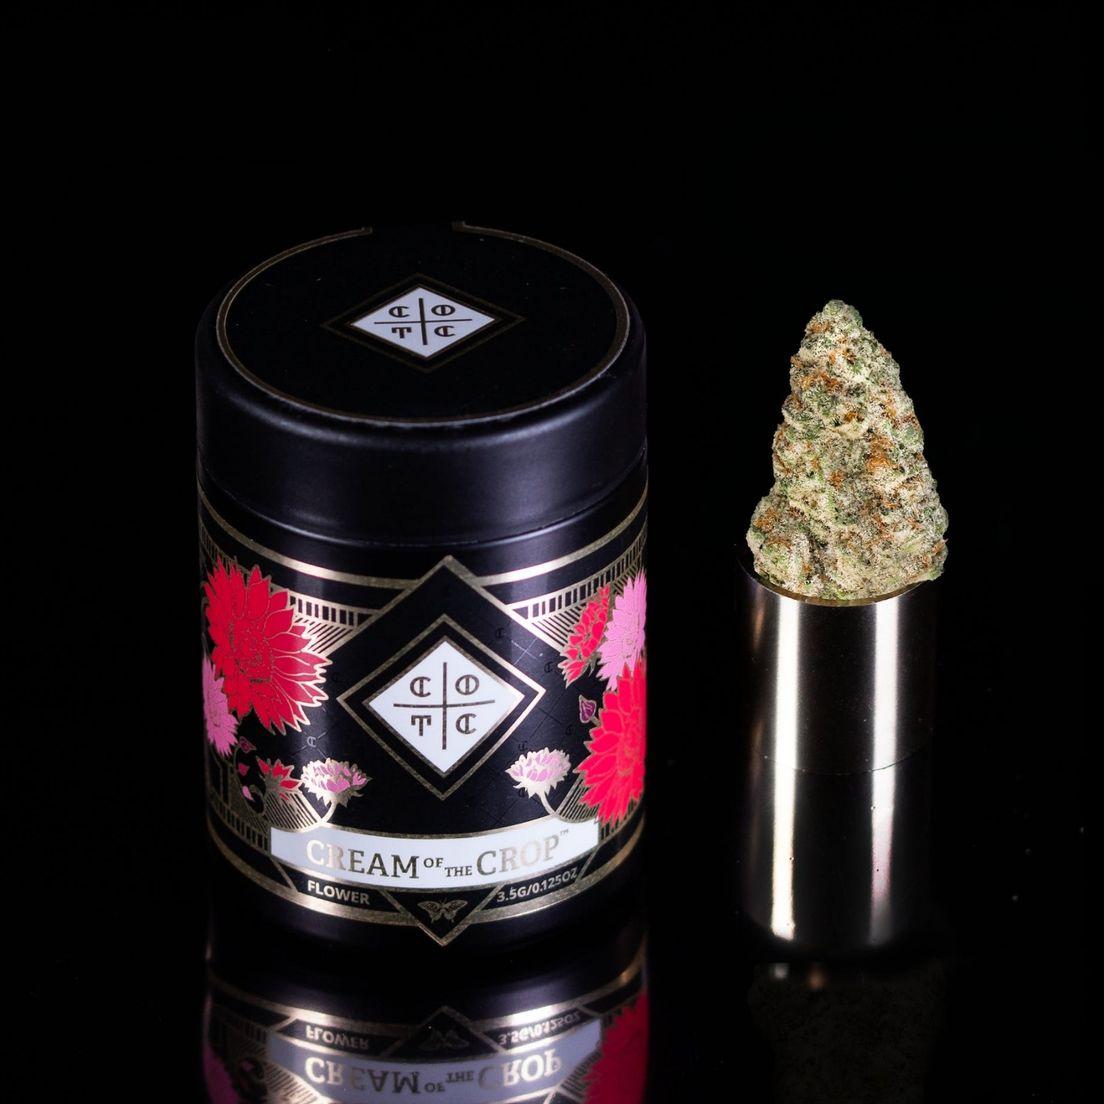 B. Cream of the Crop 1g Flower - 9/10 - Cake Crasher (~29% THC)